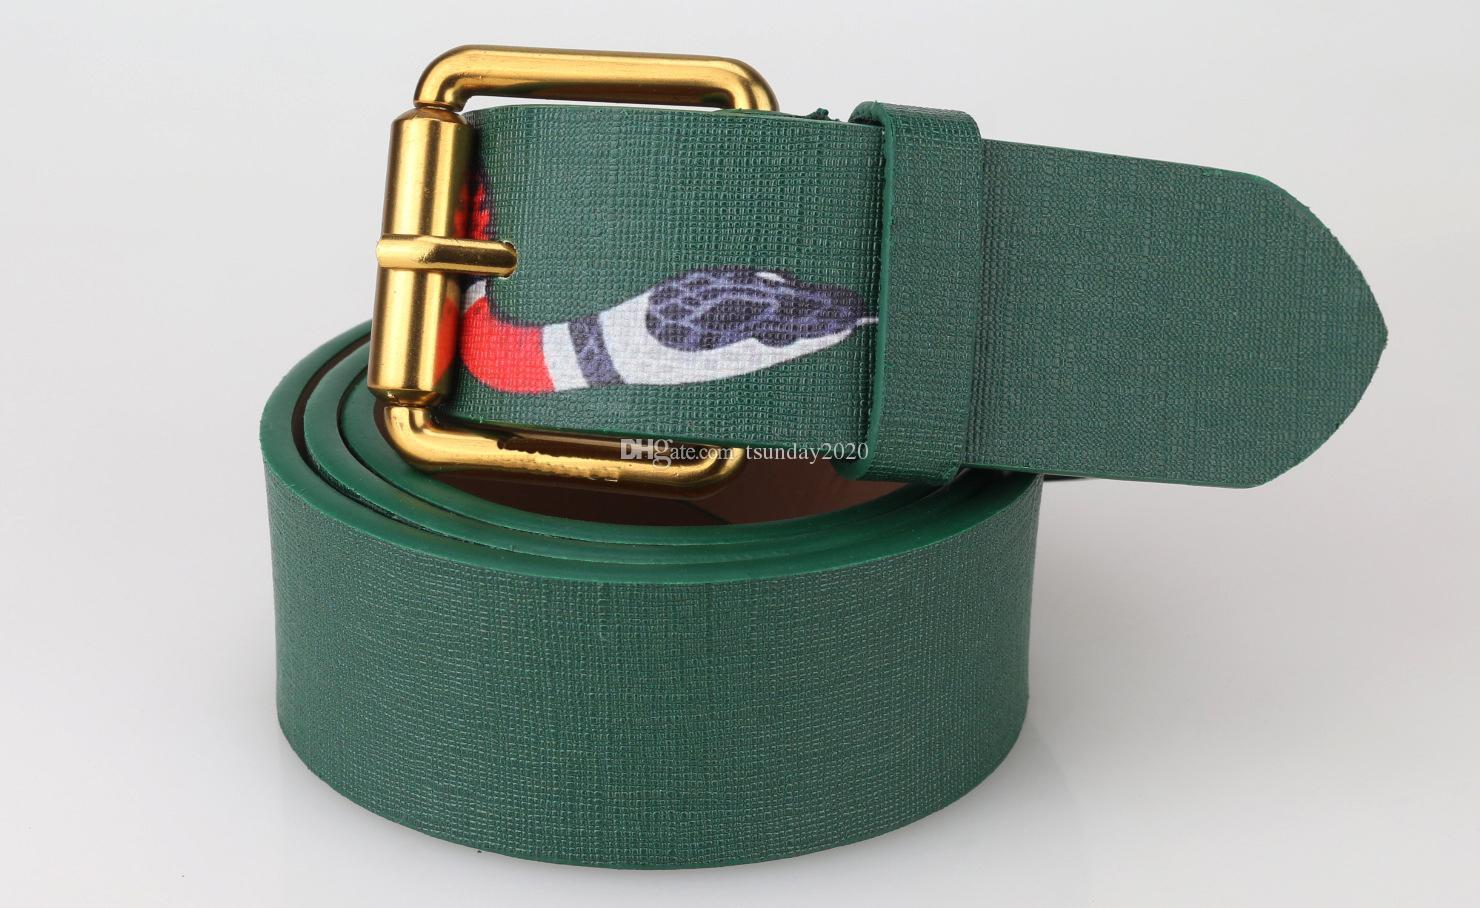 ea56a5d8a6427 Fashion 2017 Designer Belts Men High Quality Luxury Pu Belt Men/Women Hot  Buckle Ceinture Homme Mens Belts Luxury Ladies Belts Karate Belt Levels  From ...